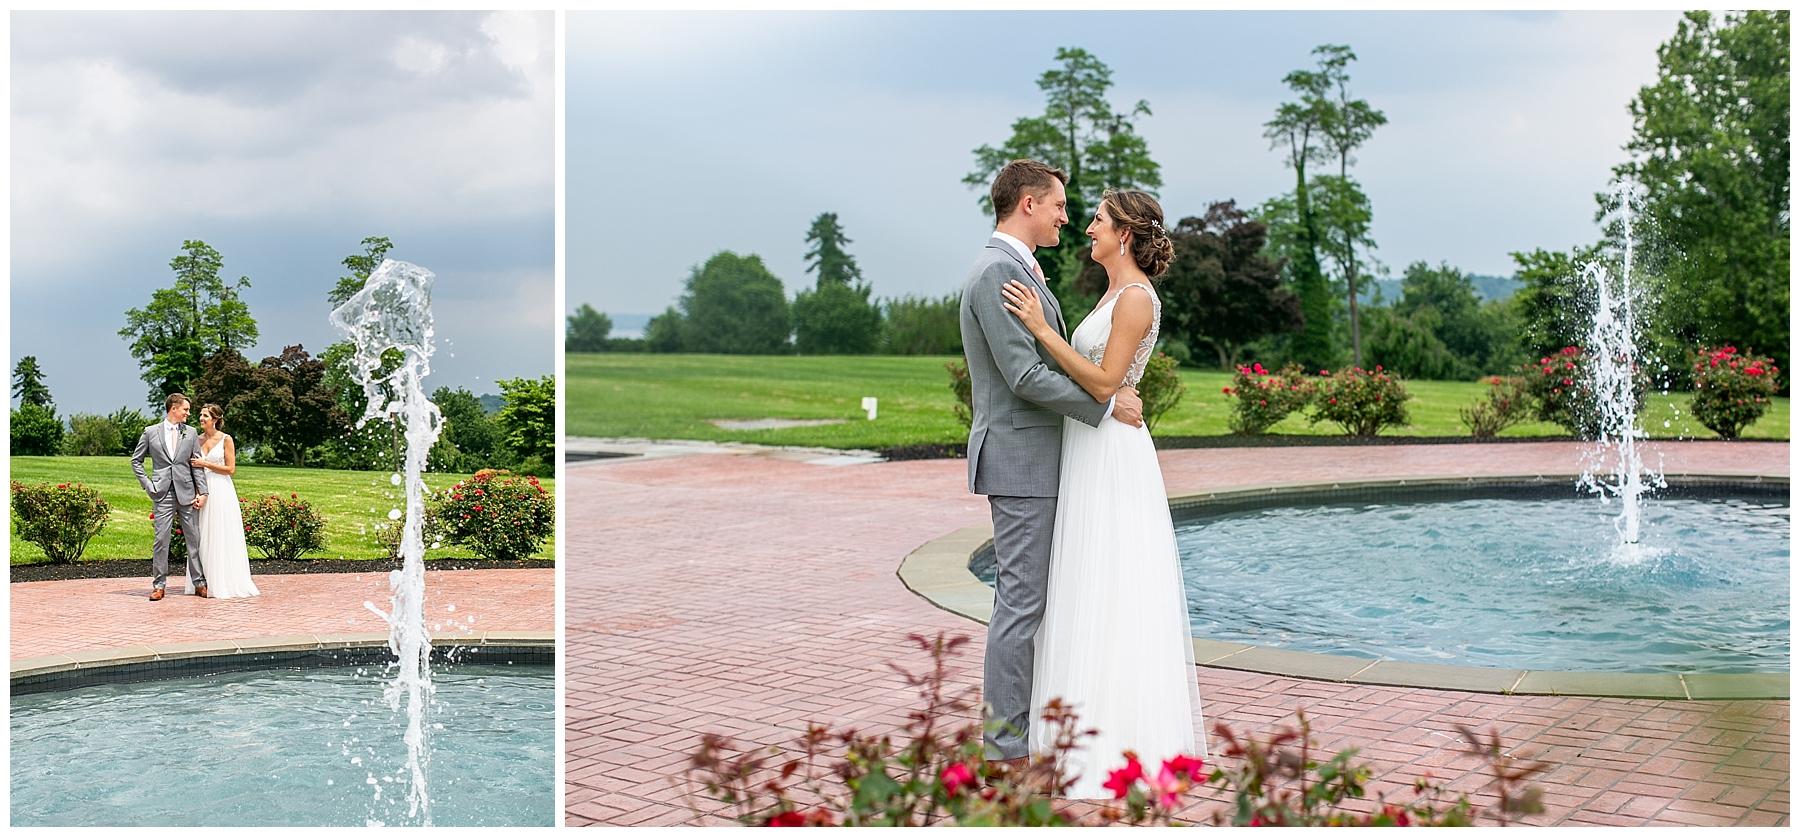 Chelsea Phil Bohemia River Overlook Wedding Living Radiant Photography photos_0053.jpg